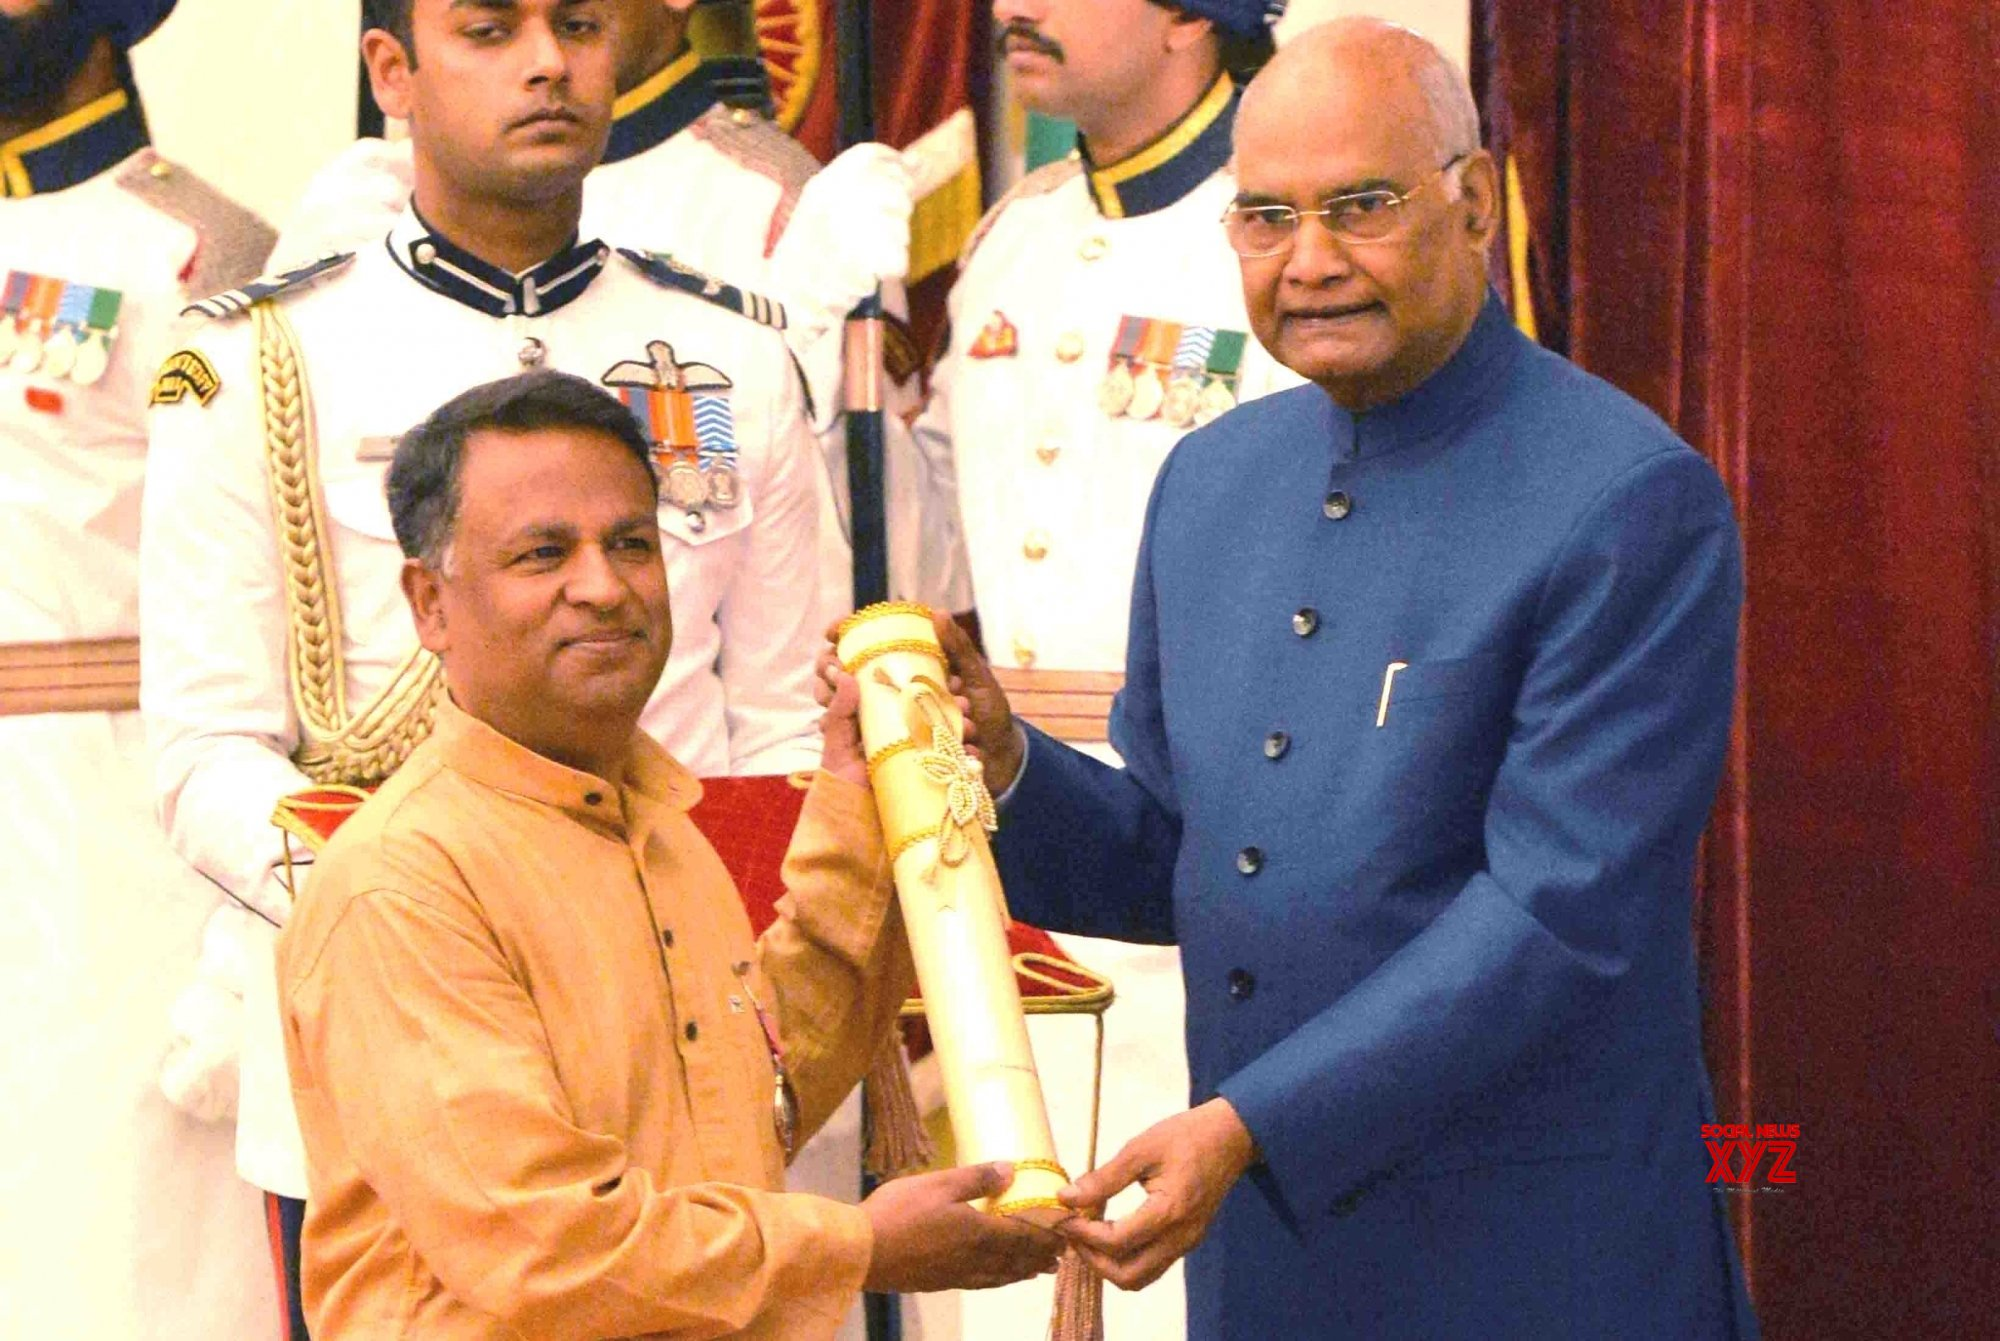 New Delhi: President Kovind presents Padma Awards - Fayaz Ahmad Jan (Batch 2) #Gallery